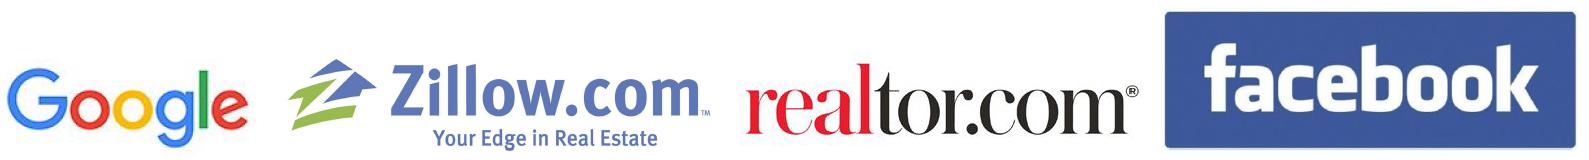 Realtor Zillow Facebook Google